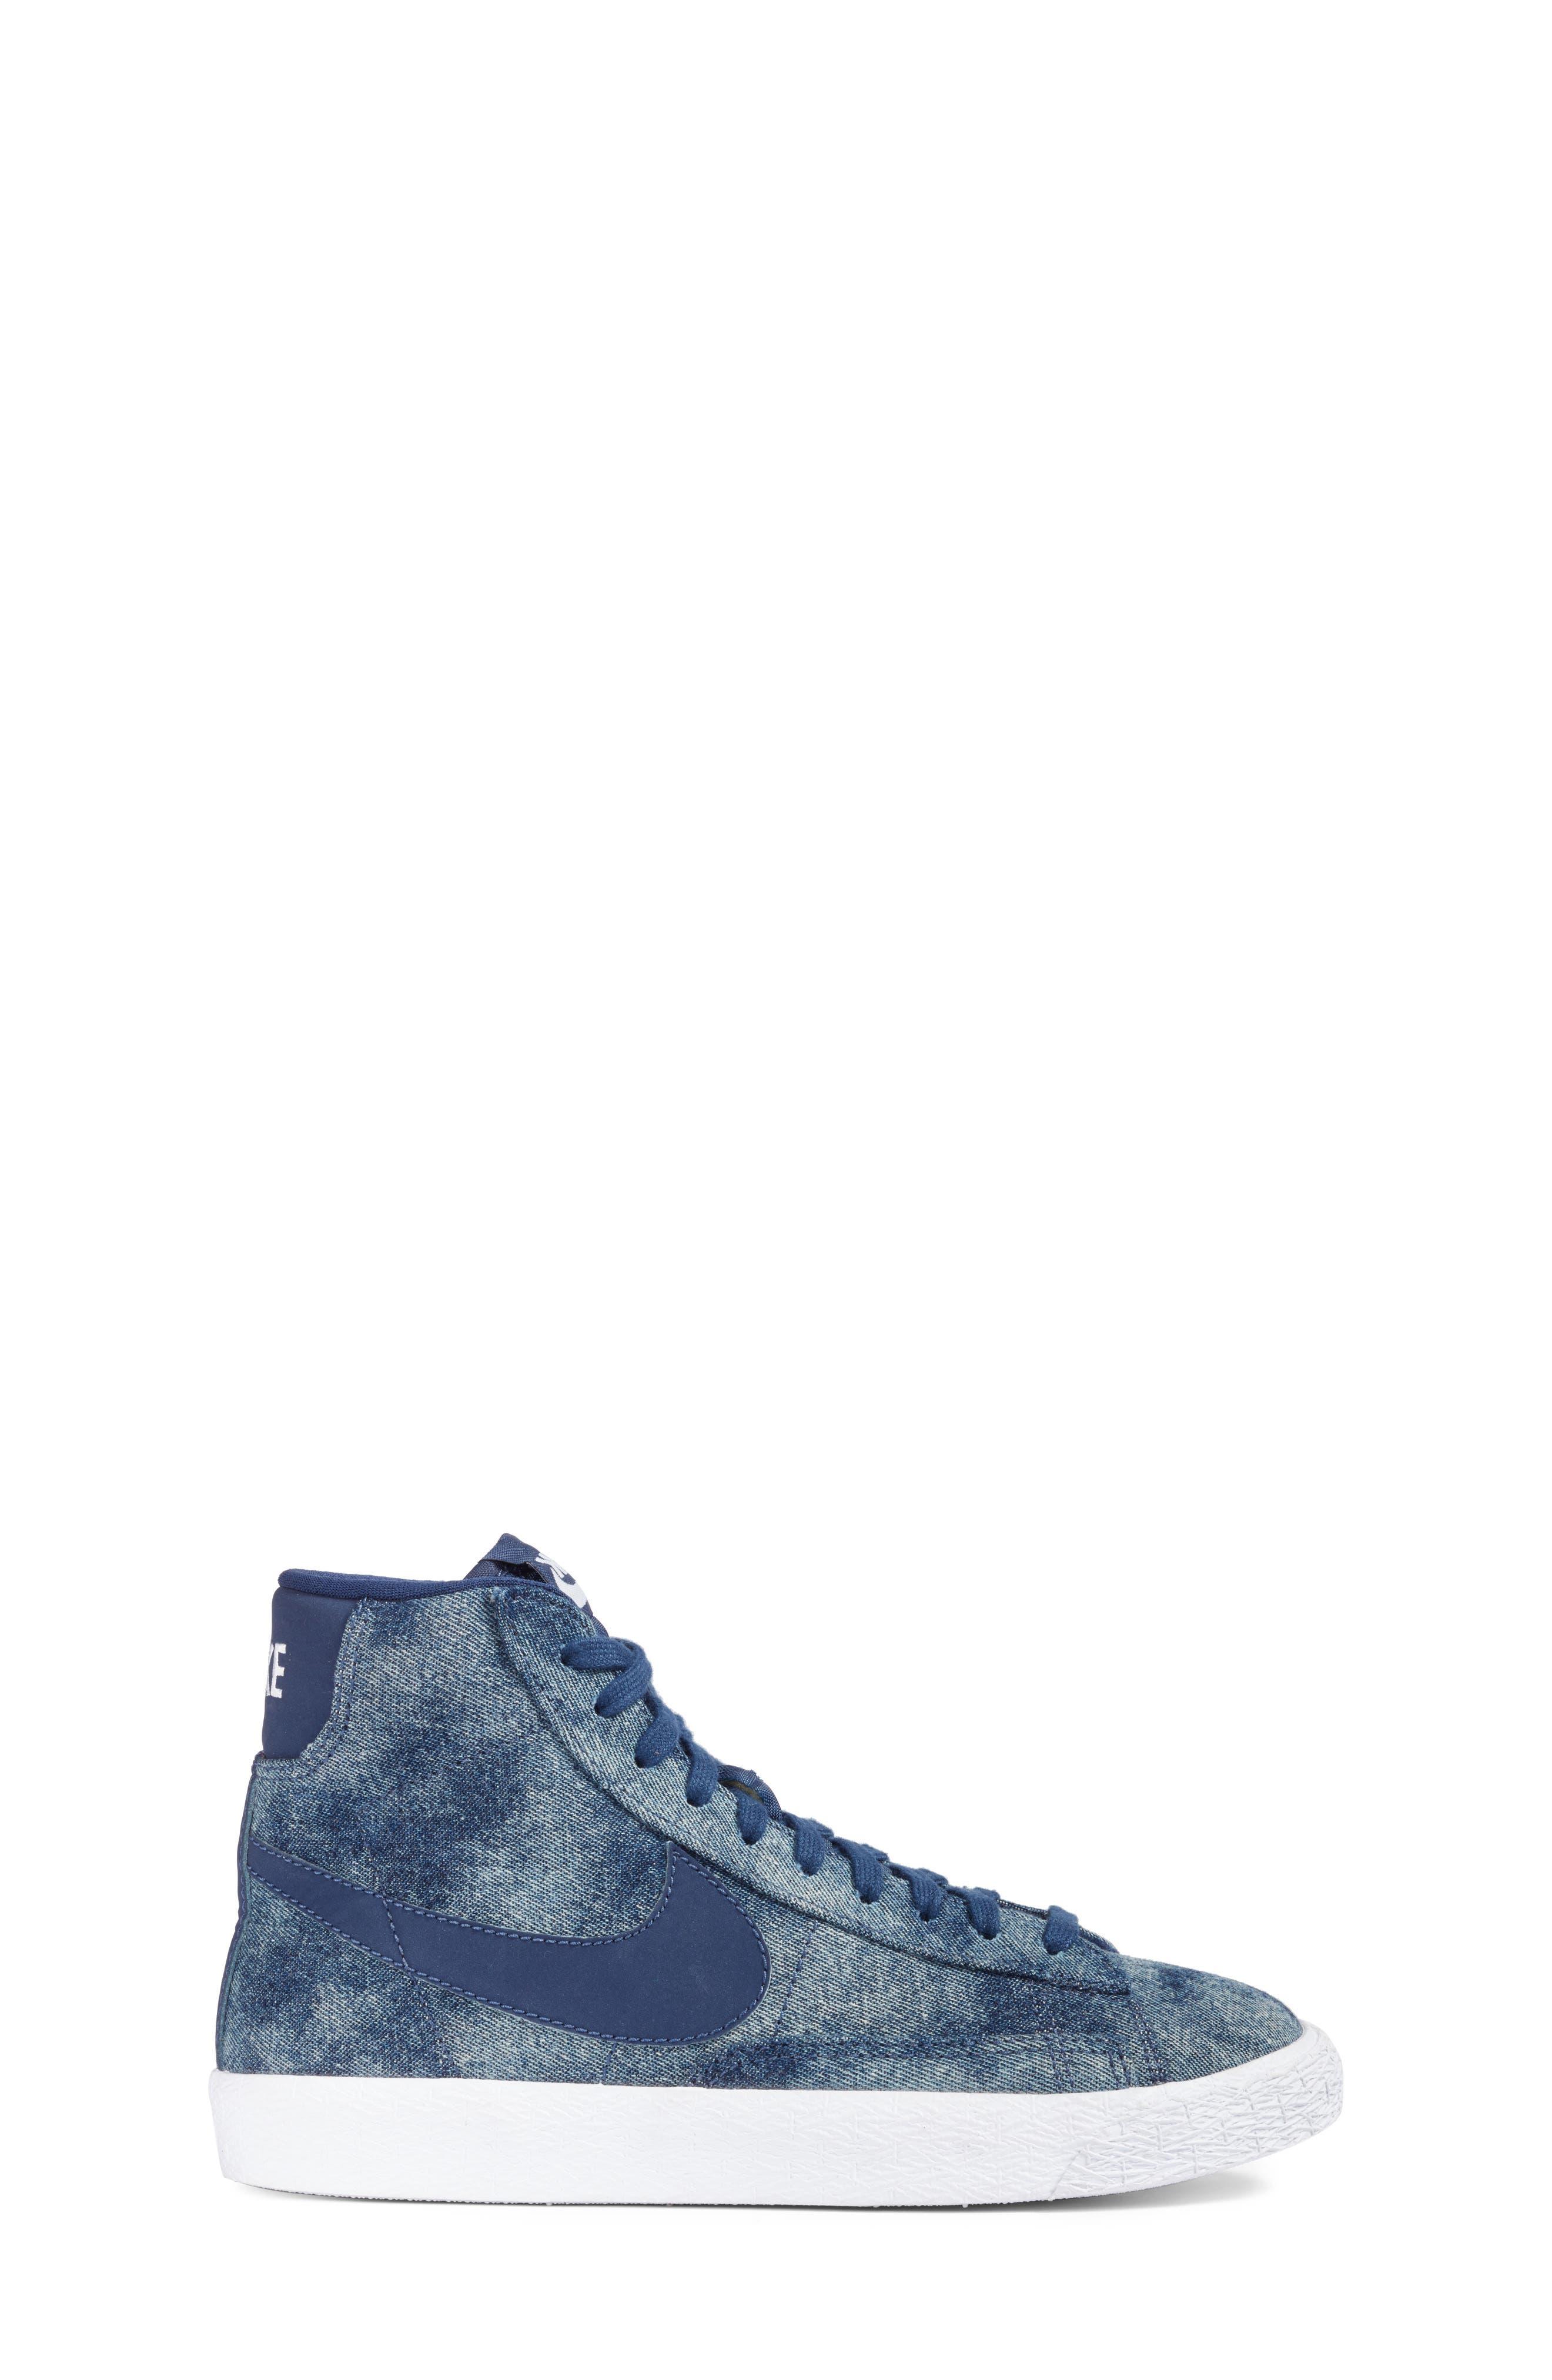 Blazer Mid SE High Top Sneaker,                             Alternate thumbnail 9, color,